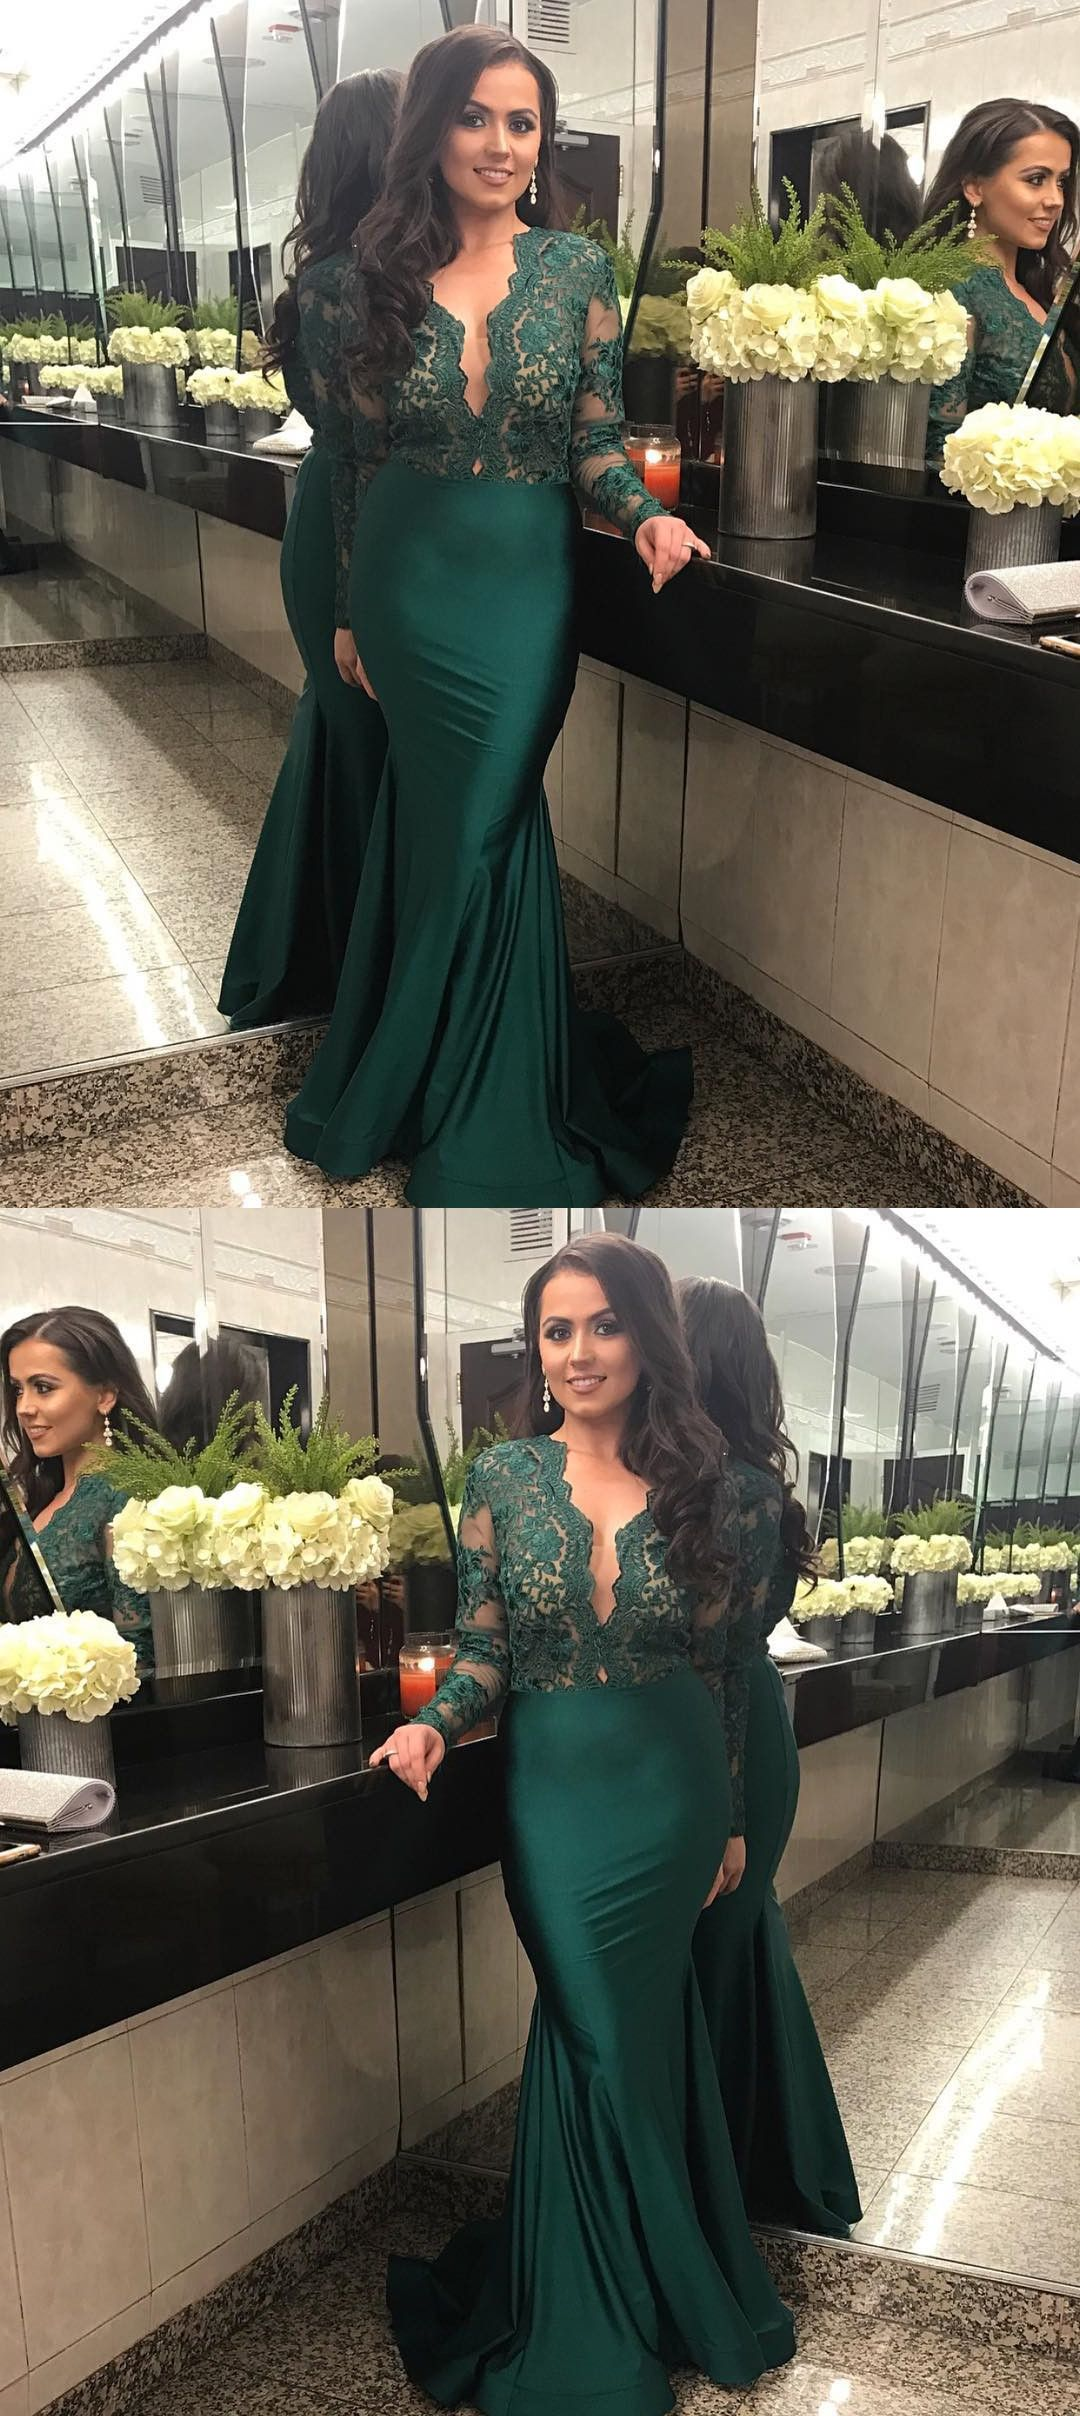 Hunter Green Prom Dress V Neck Mermaid Party Dress Satin Evening Dres Long Sleeve Bridesmaid Dress Prom Dresses Long With Sleeves Emerald Green Evening Dress [ 2416 x 1080 Pixel ]